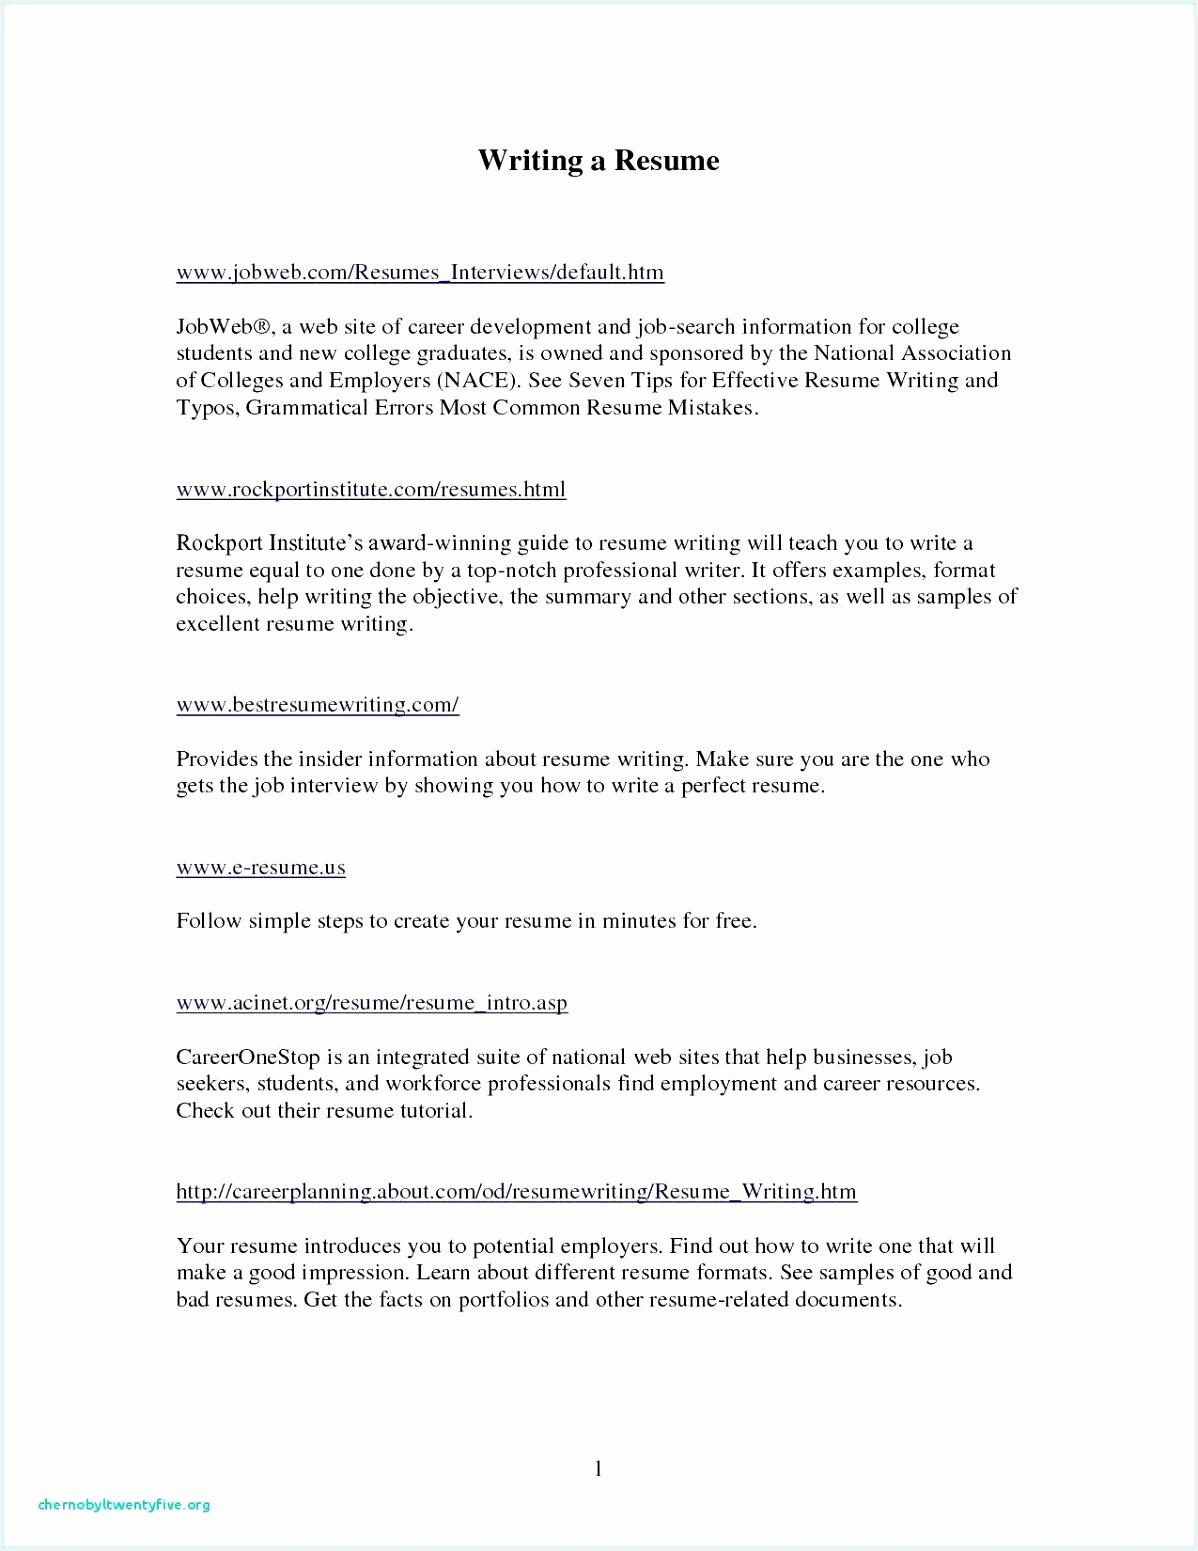 Resume Cover Letter Banking Position New Resume Sample For Fresh Graduate Banking Valid Cover Letter Examples 15511198sszvn